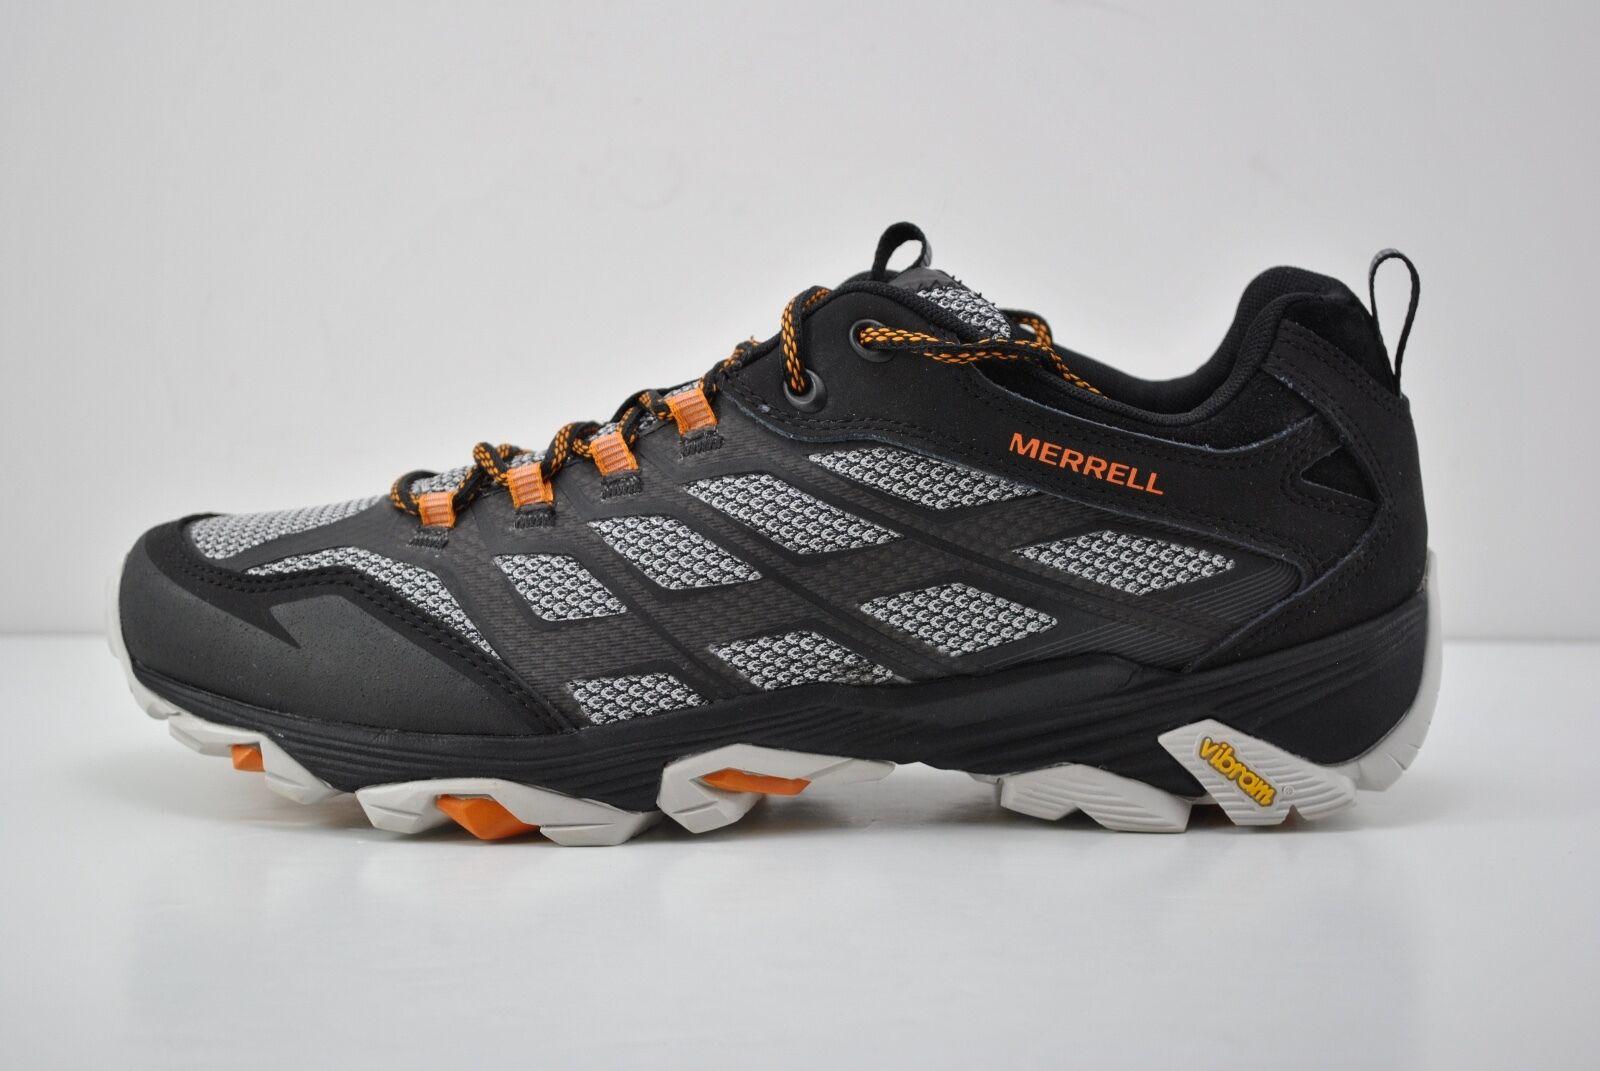 Mens Mens Mens Merrell Moab FST Trail Running scarpe Dimensione 8.5 nero bianca arancia J35779 40a0bd